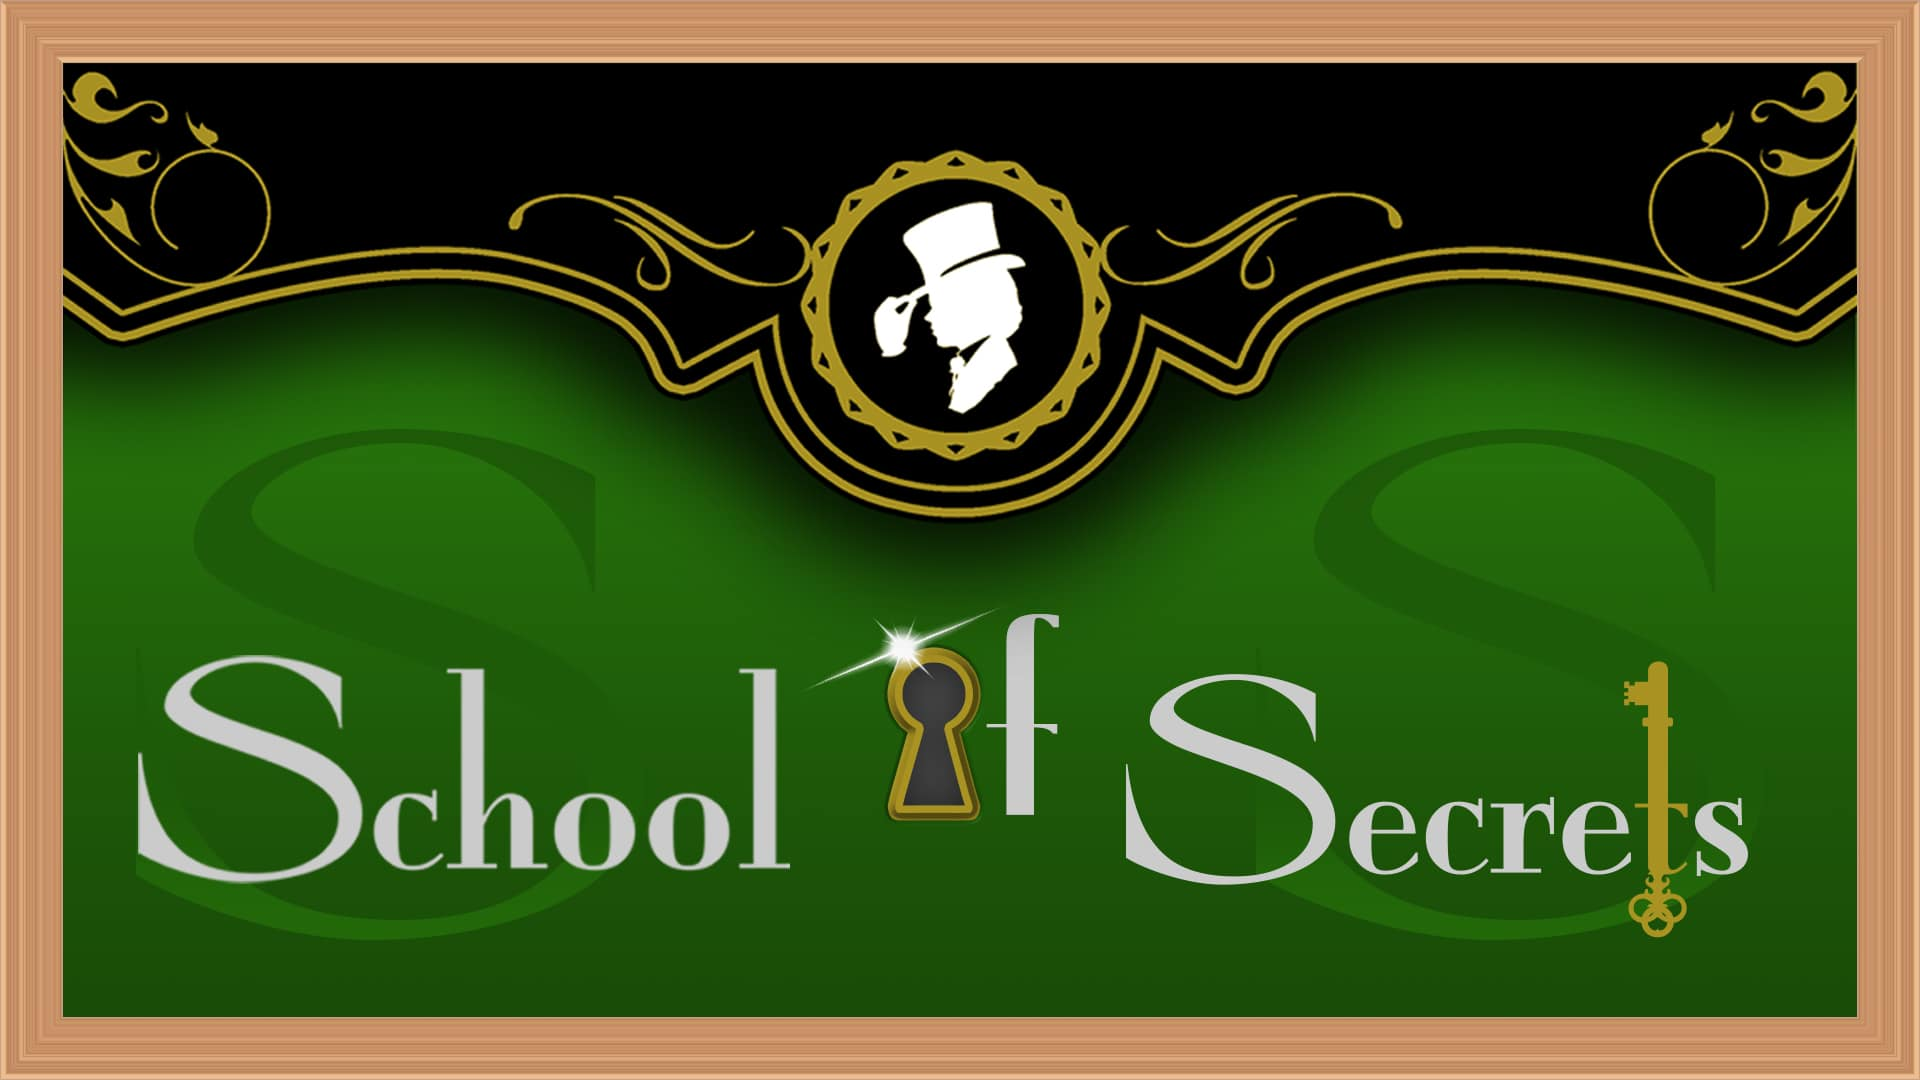 Schoolsecretslogo